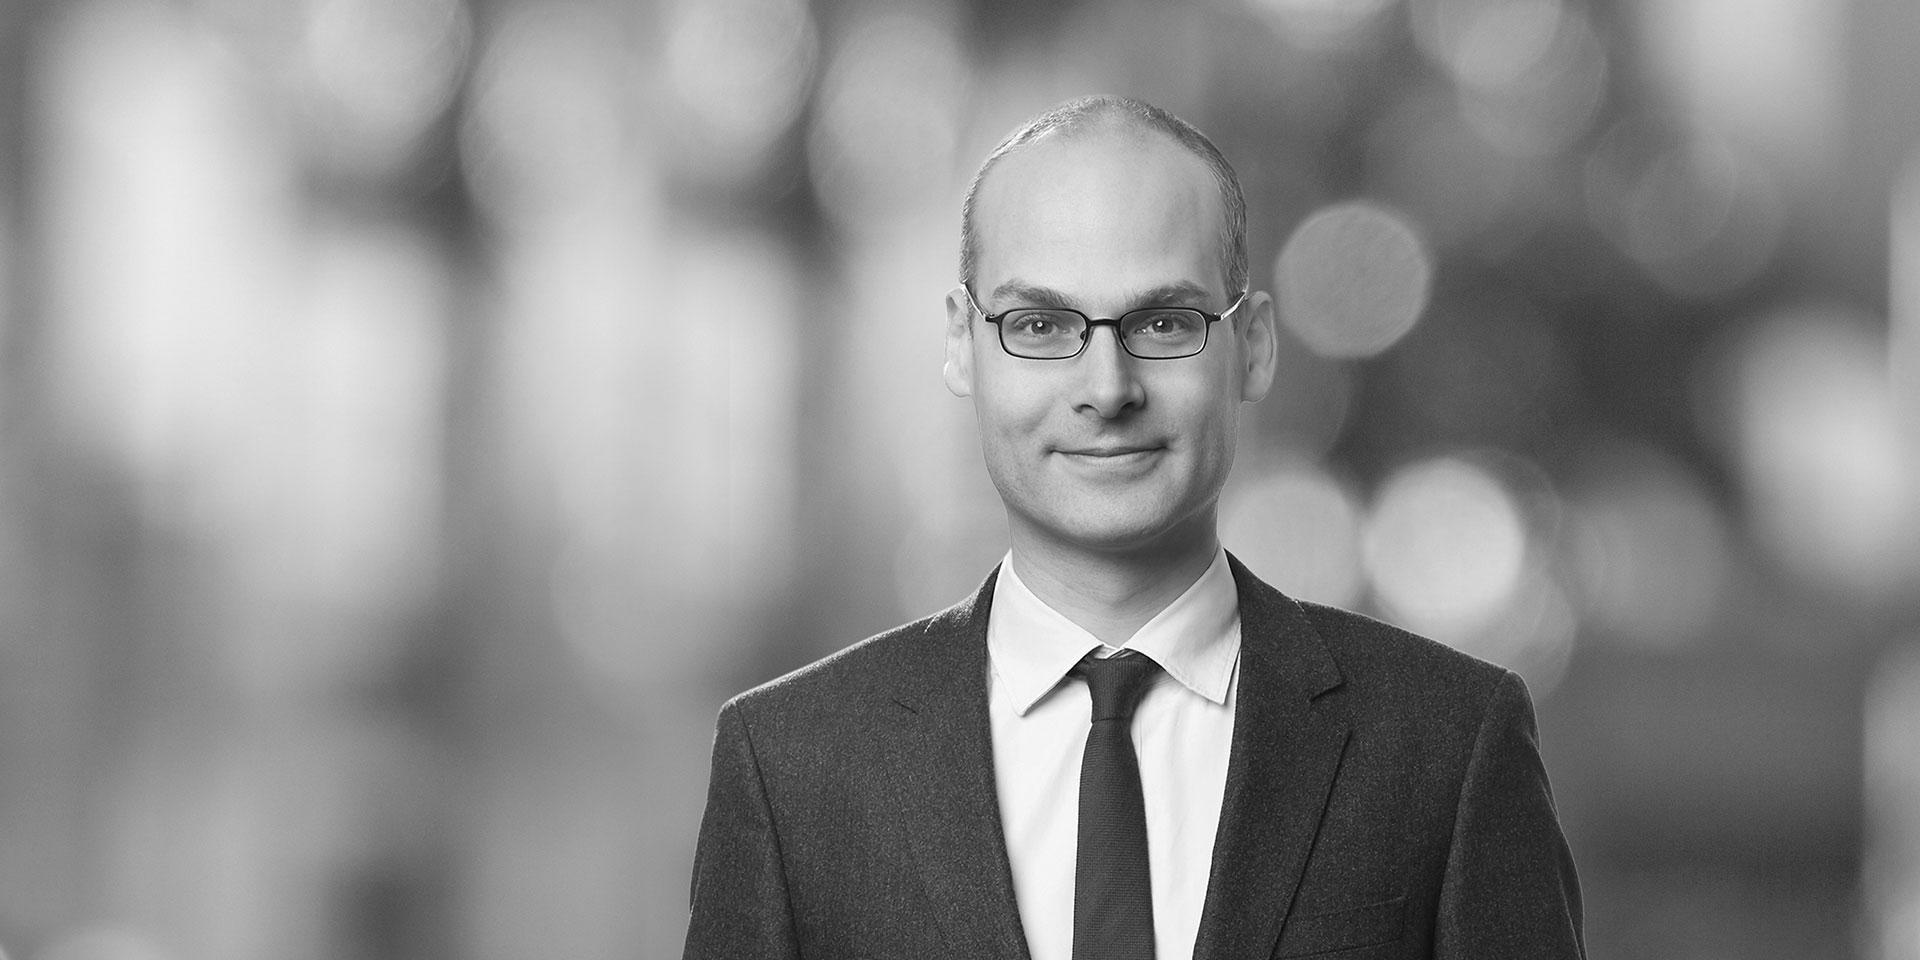 Matthias Kiesewetter